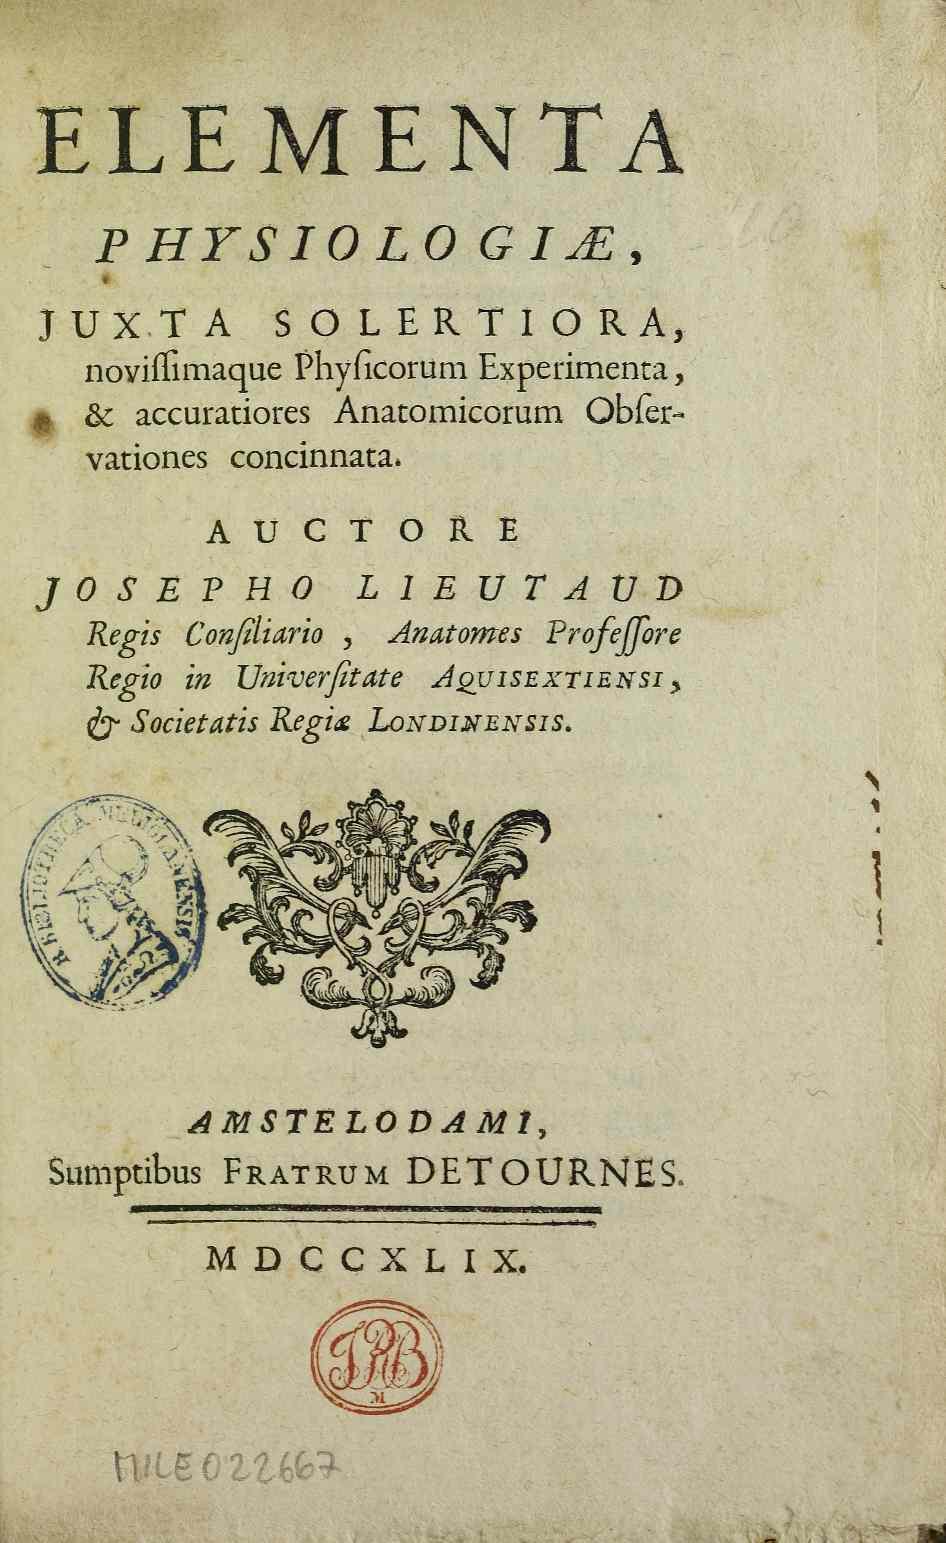 Joseph Lieutaud